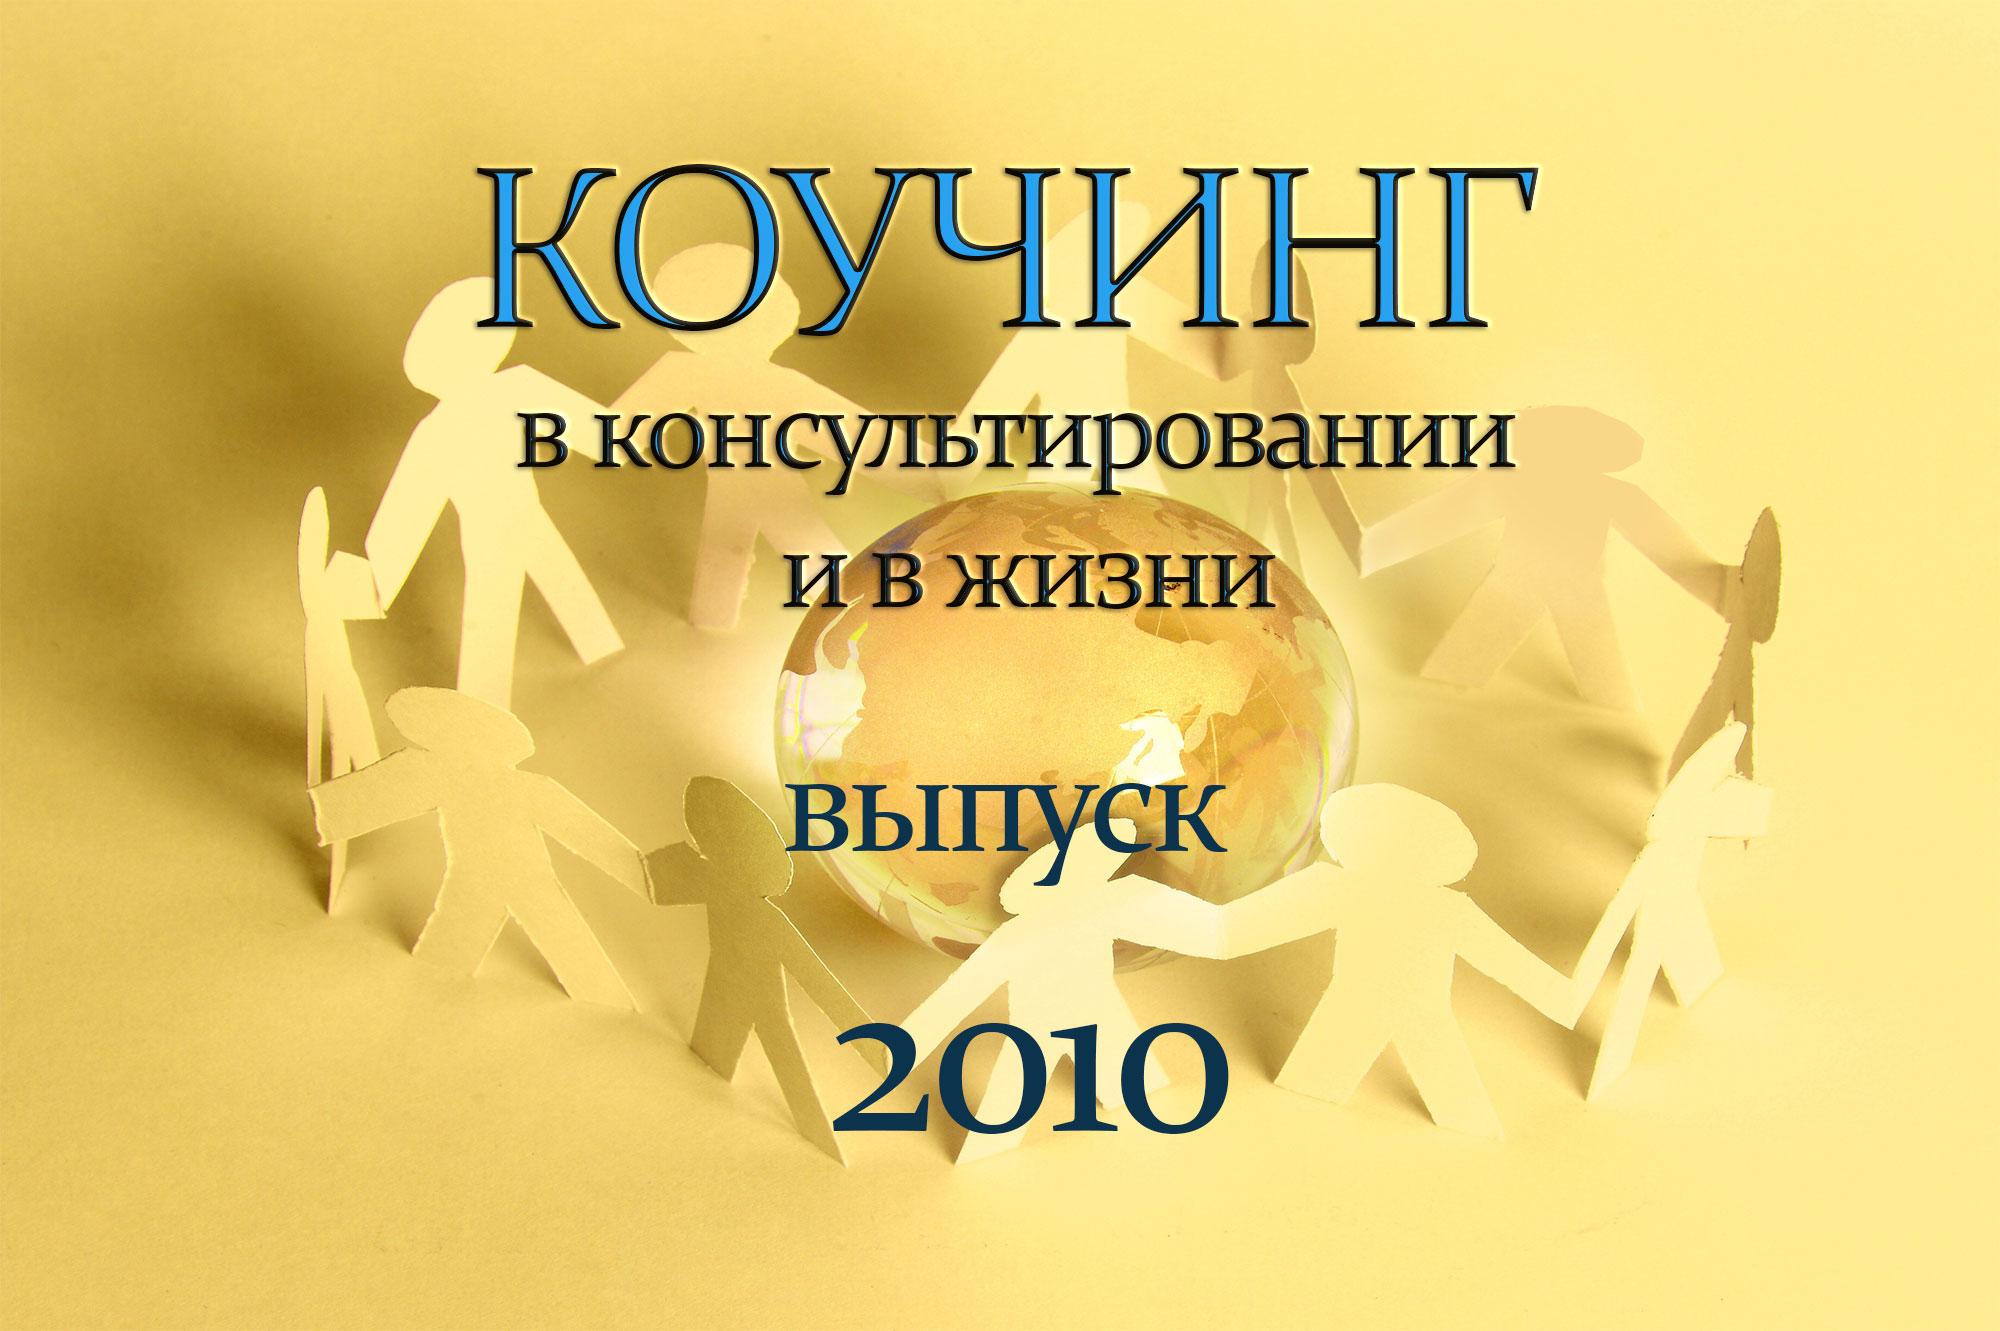 http://psyholog.biz/wp-content/uploads/2017/09/kouching2010.jpg